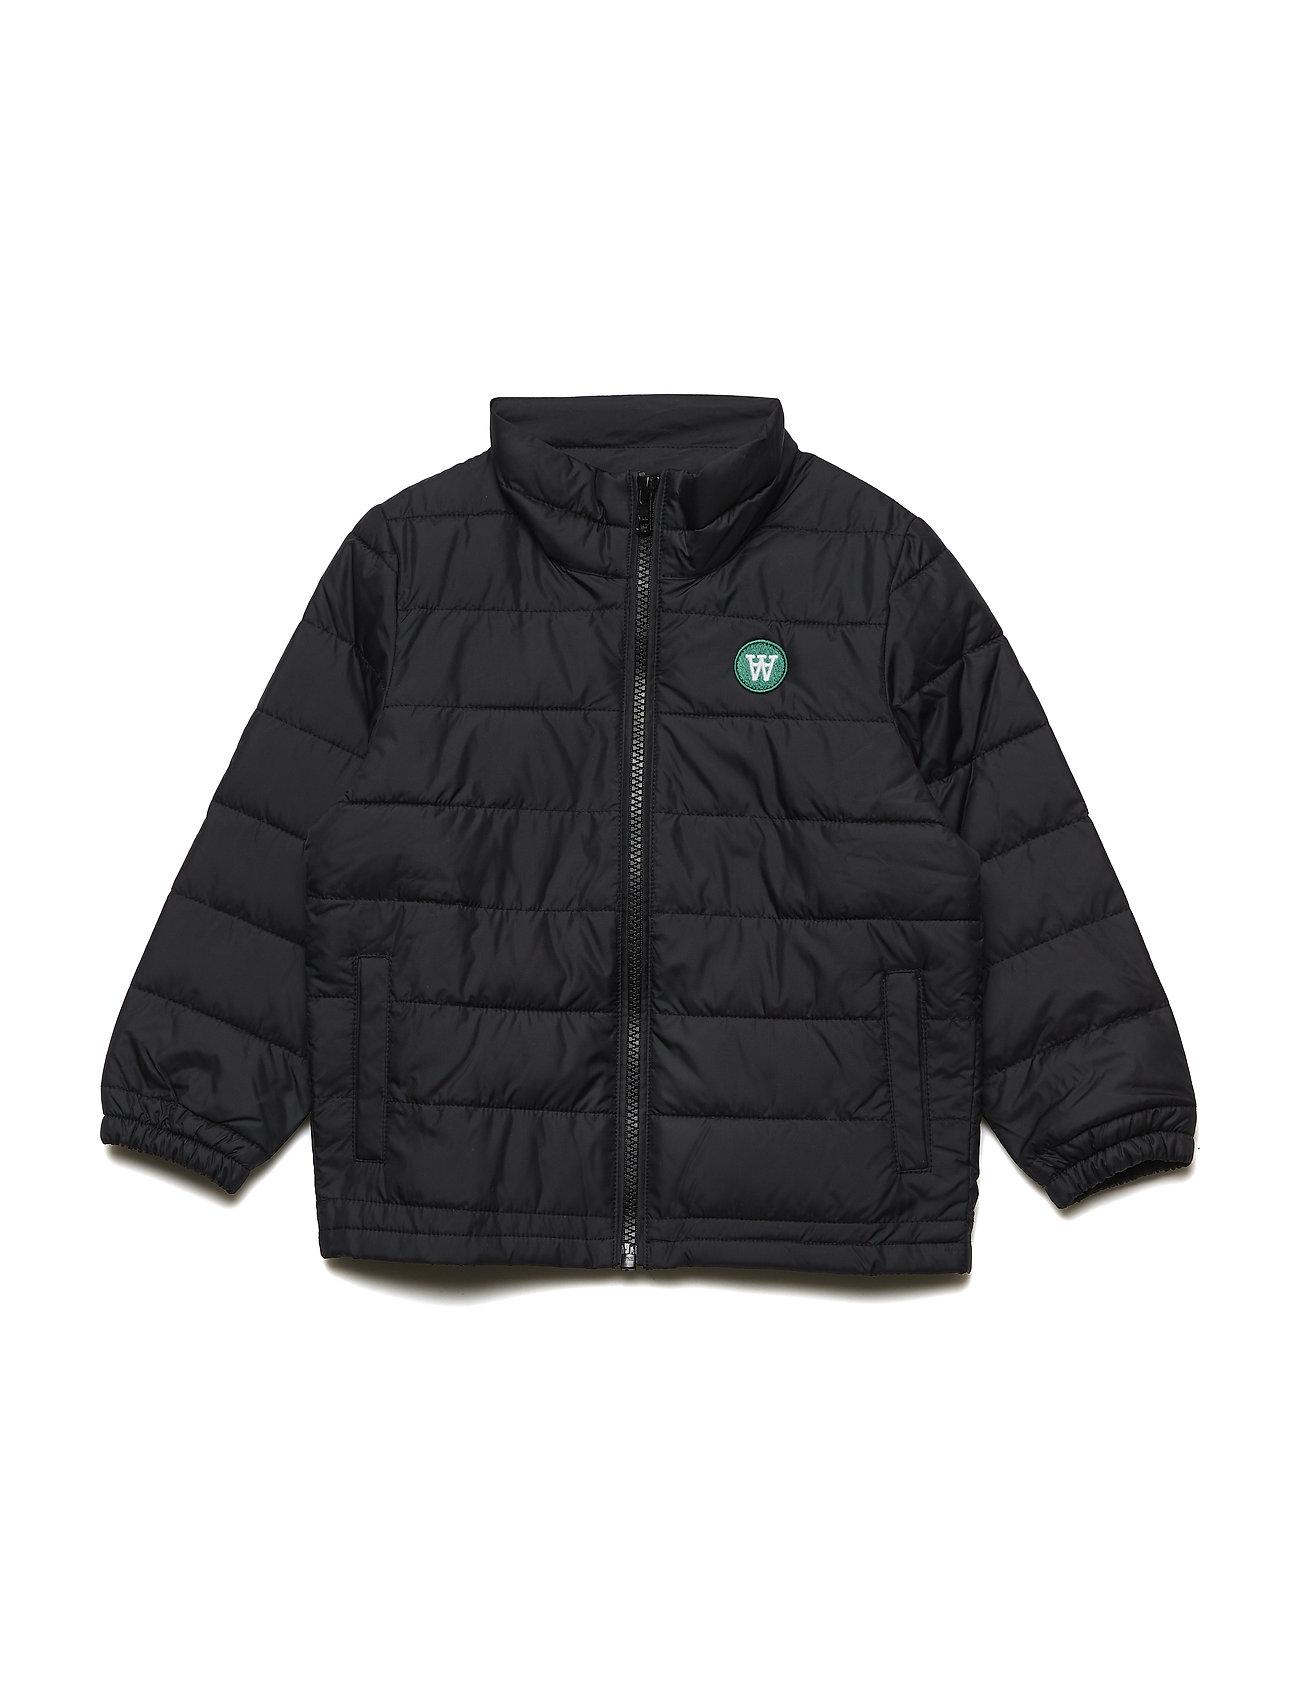 Wood Wood Moe jacket - BLACK